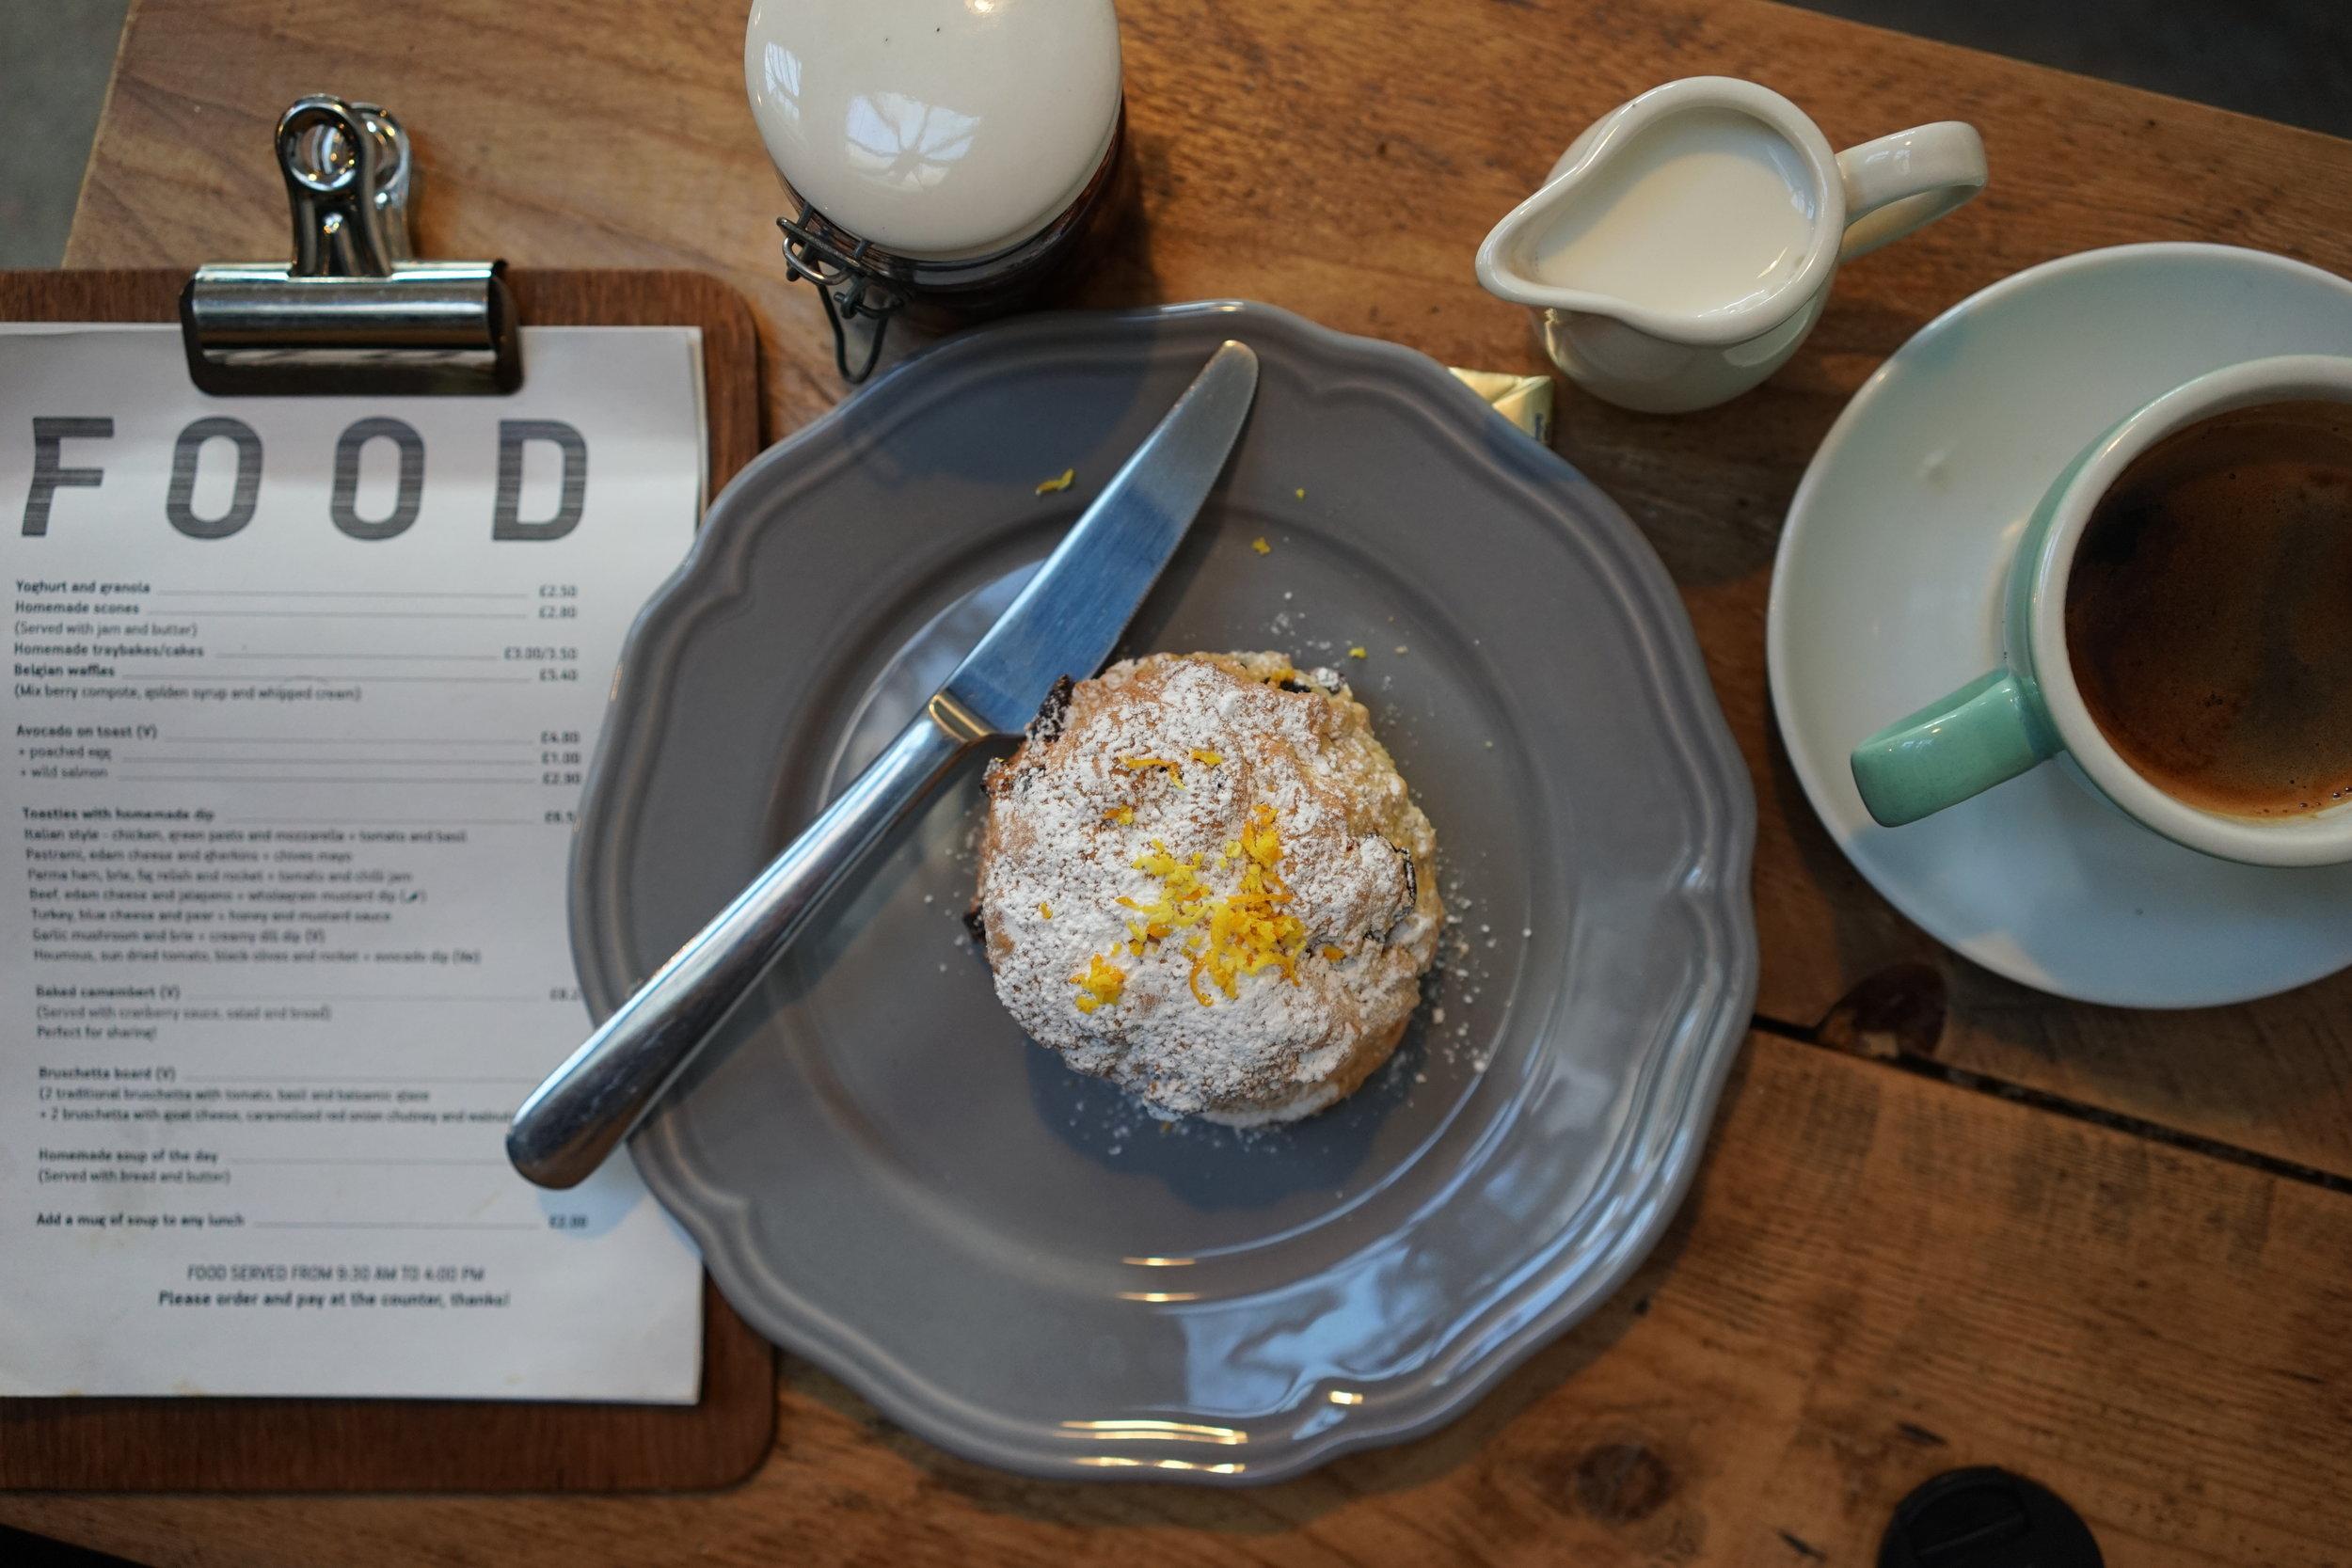 10 Best Coffee Shops in Edinburgh - Condé Nast Traveler